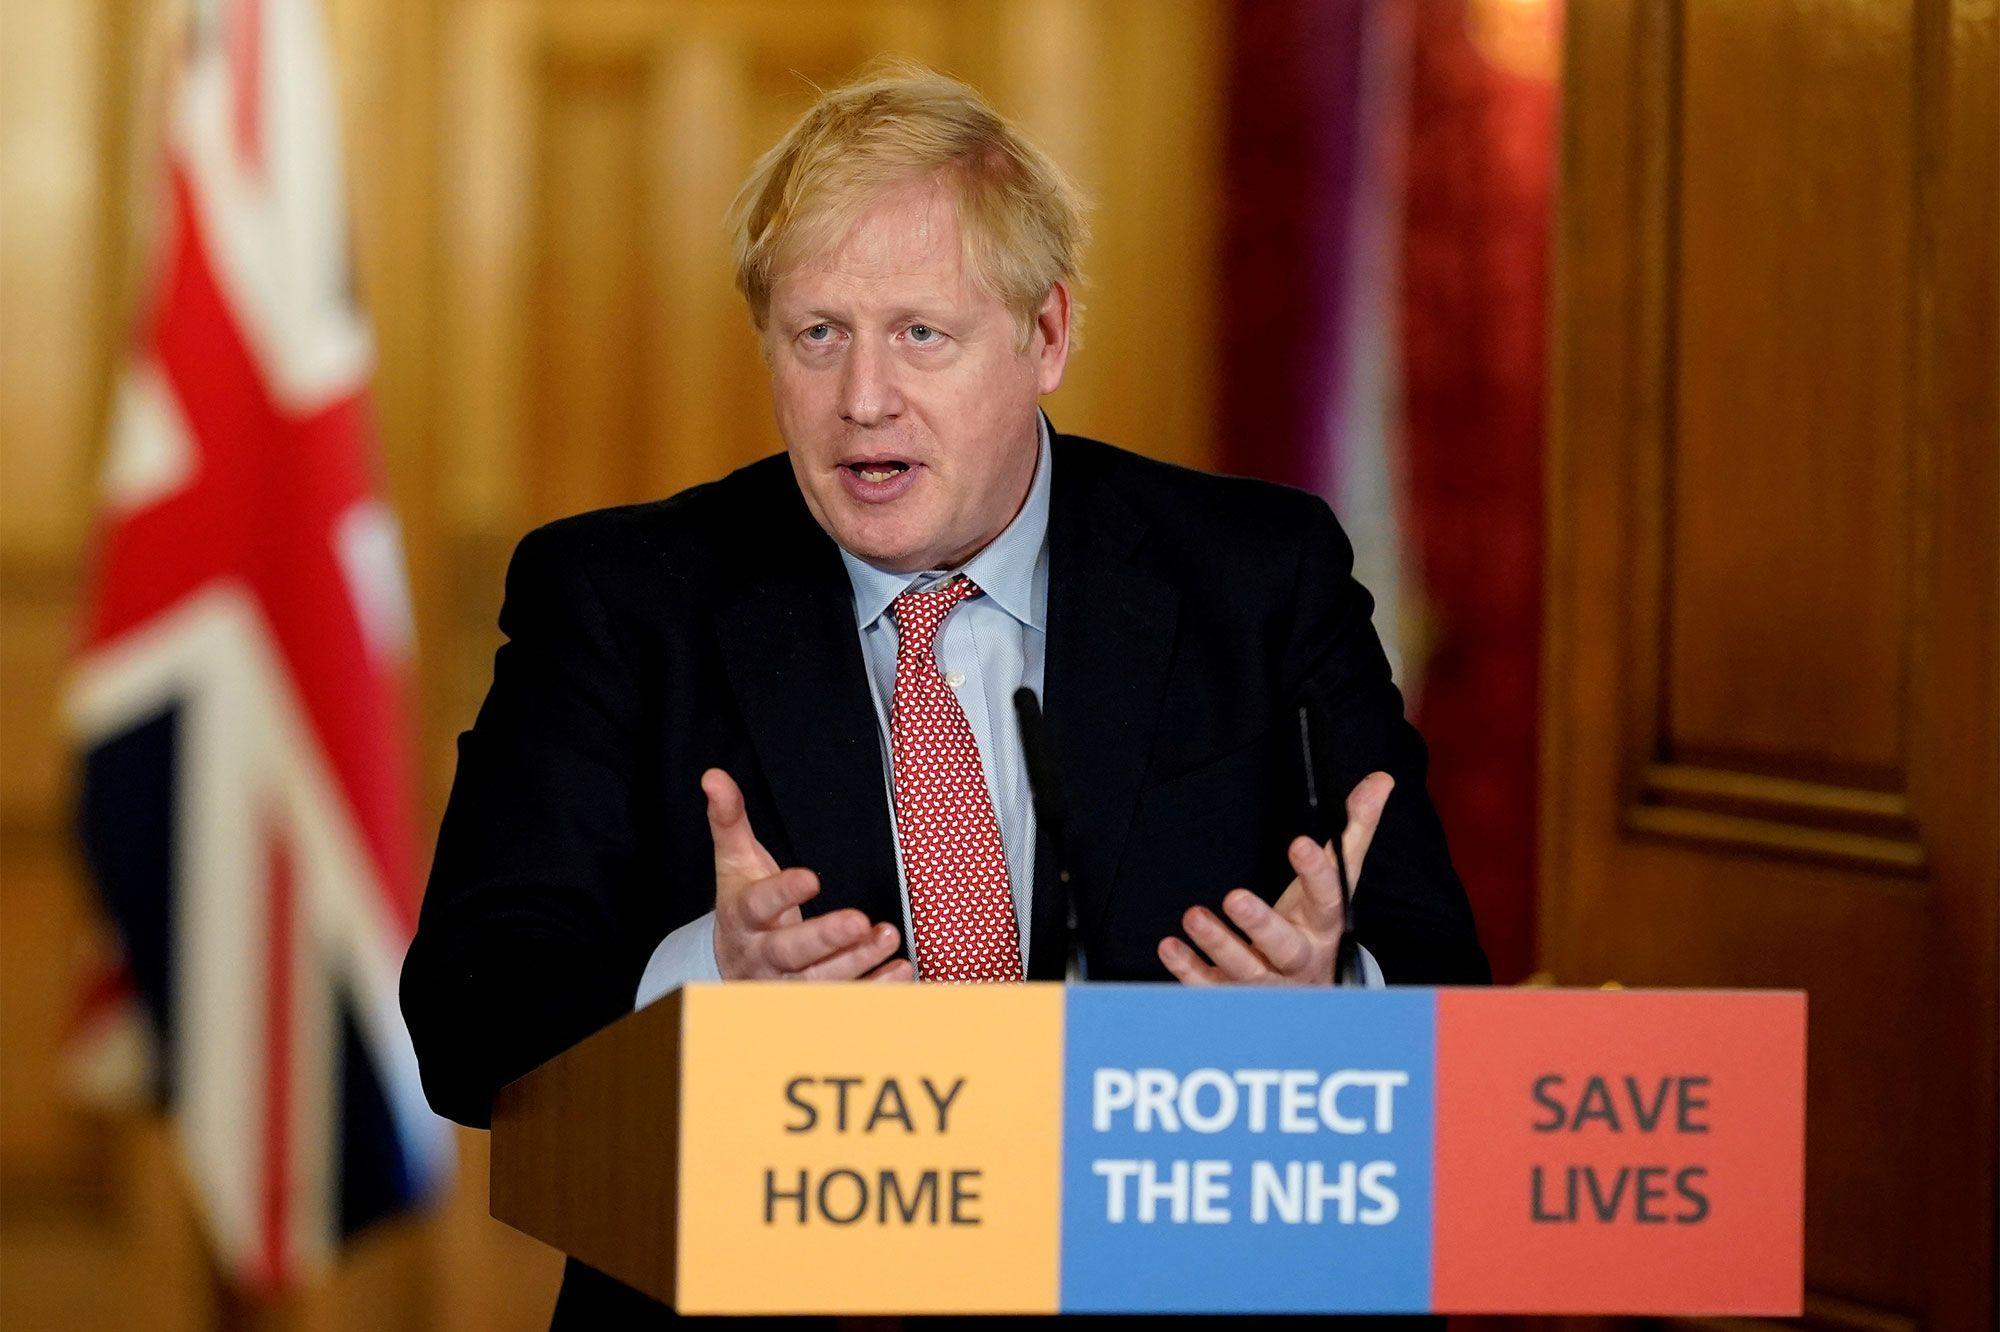 Coronavirus : plus de 1000 morts au Royaume-Uni